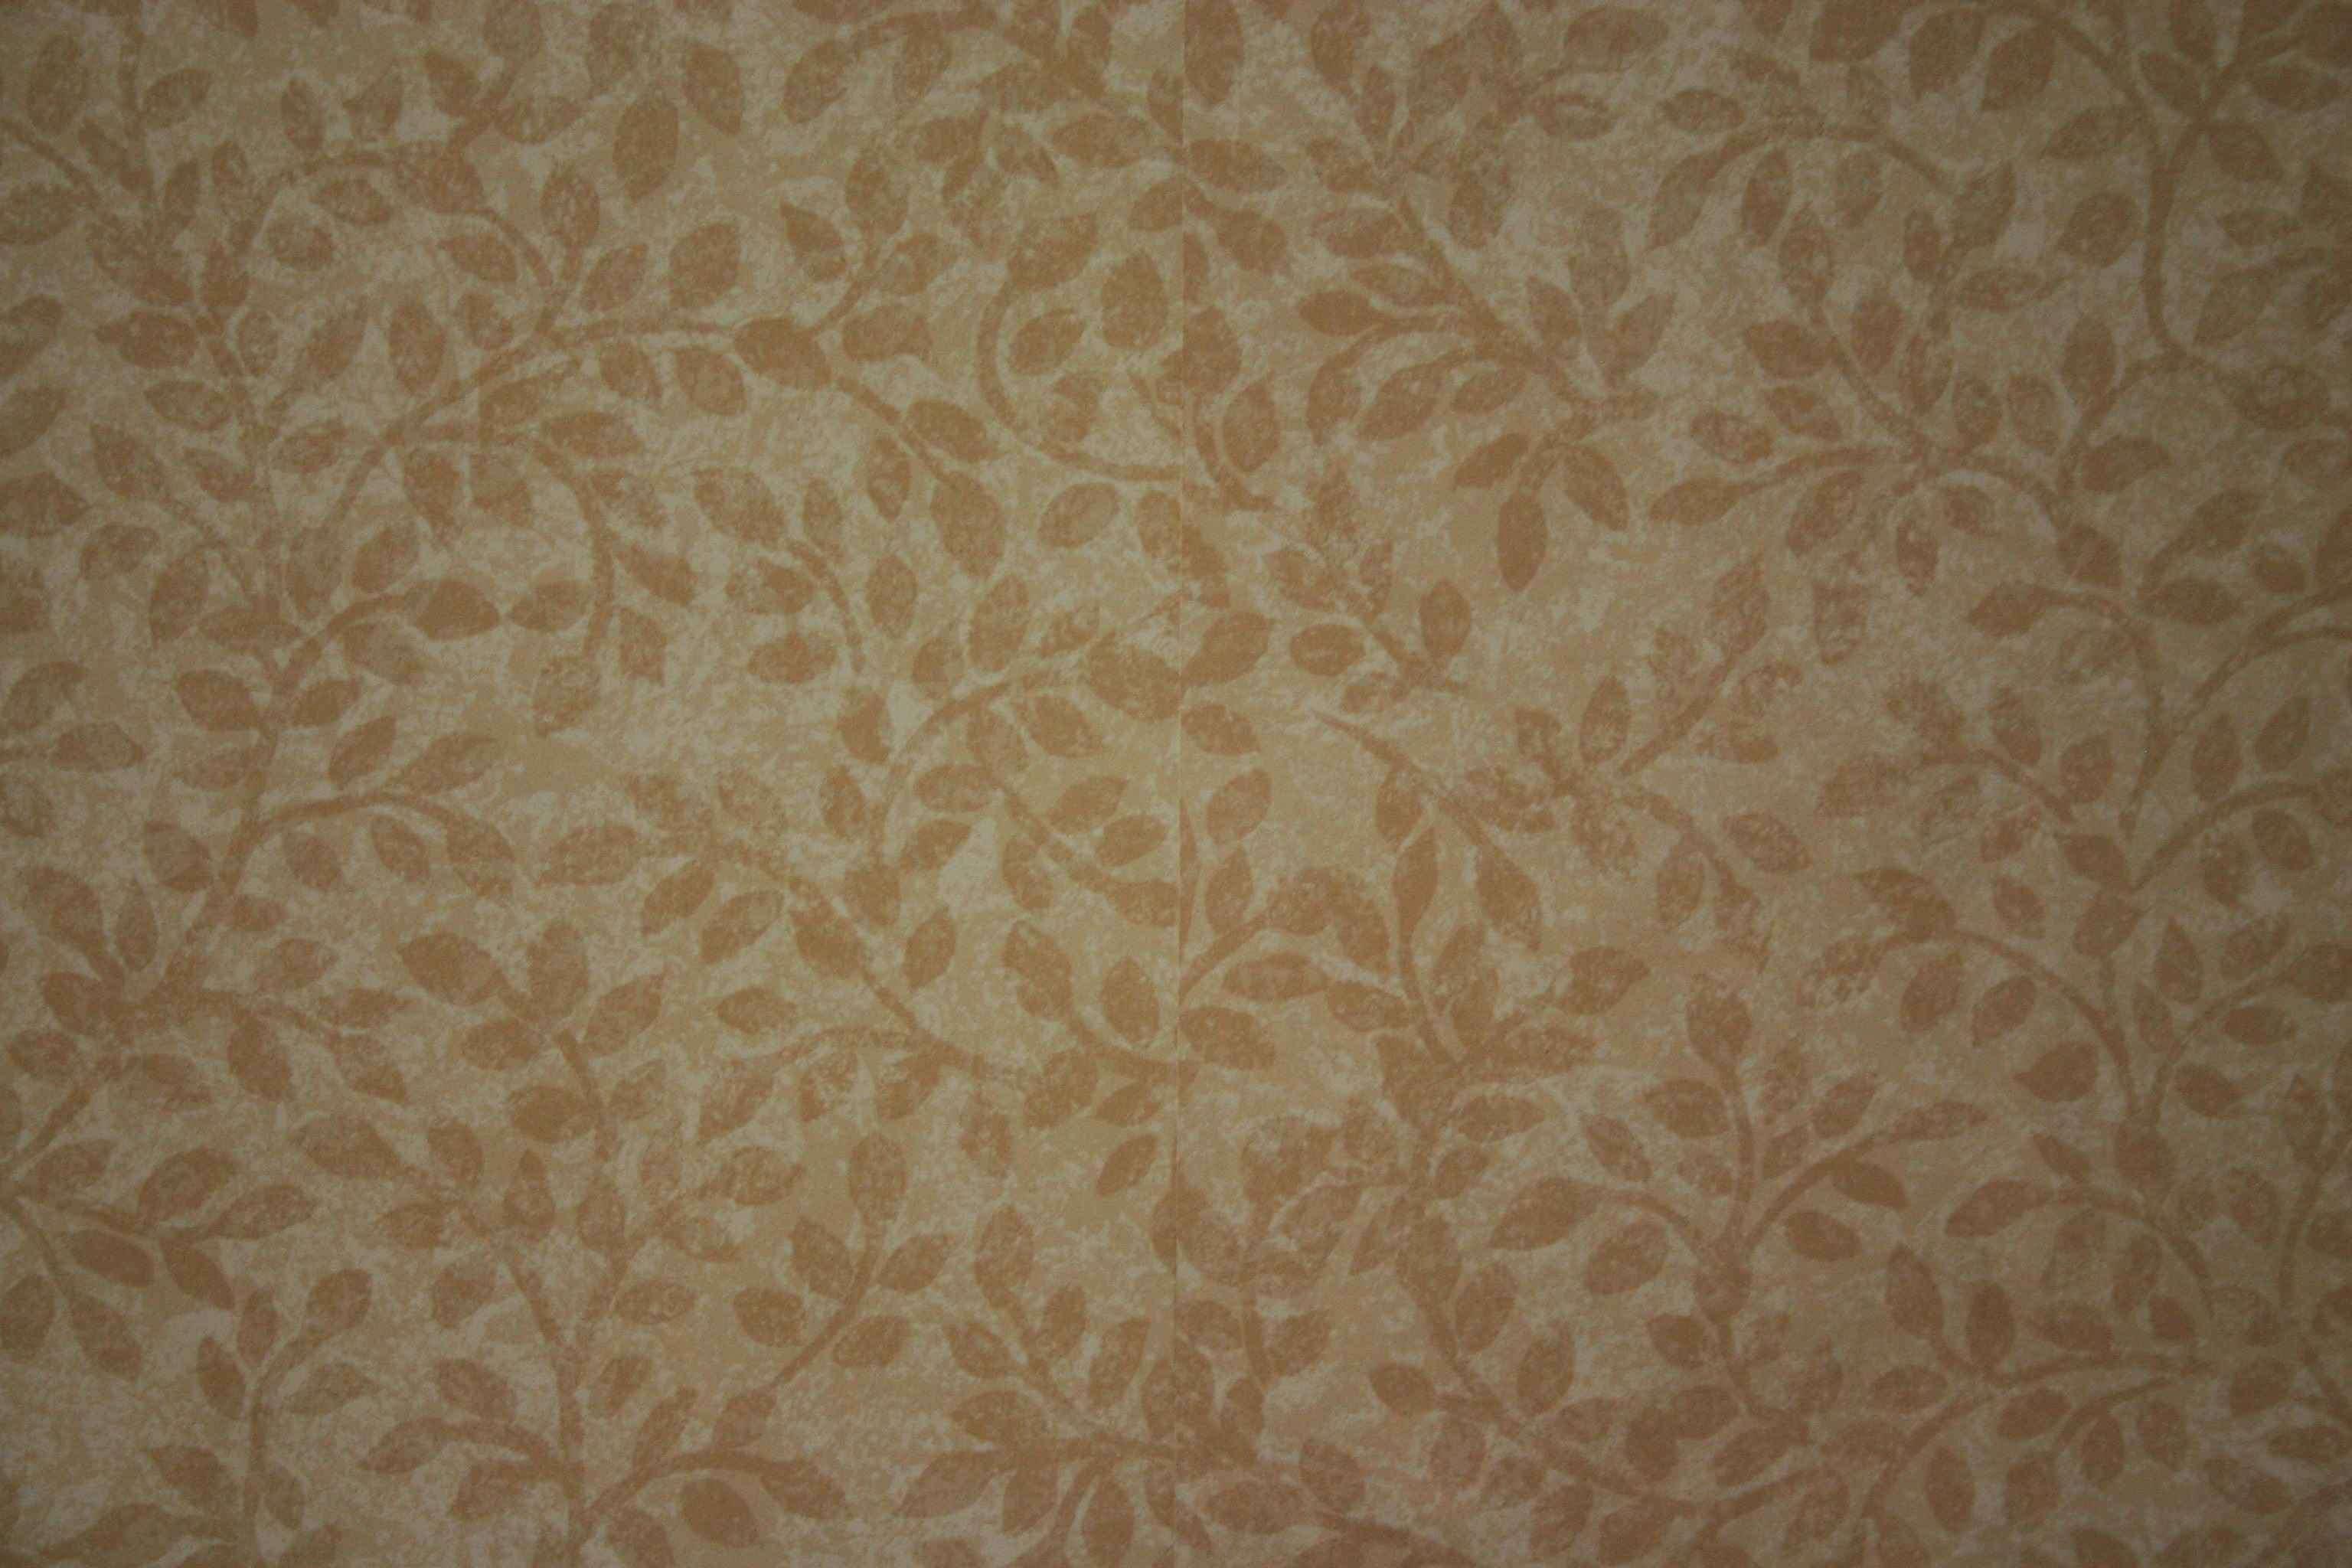 Floral Wallpaper 036